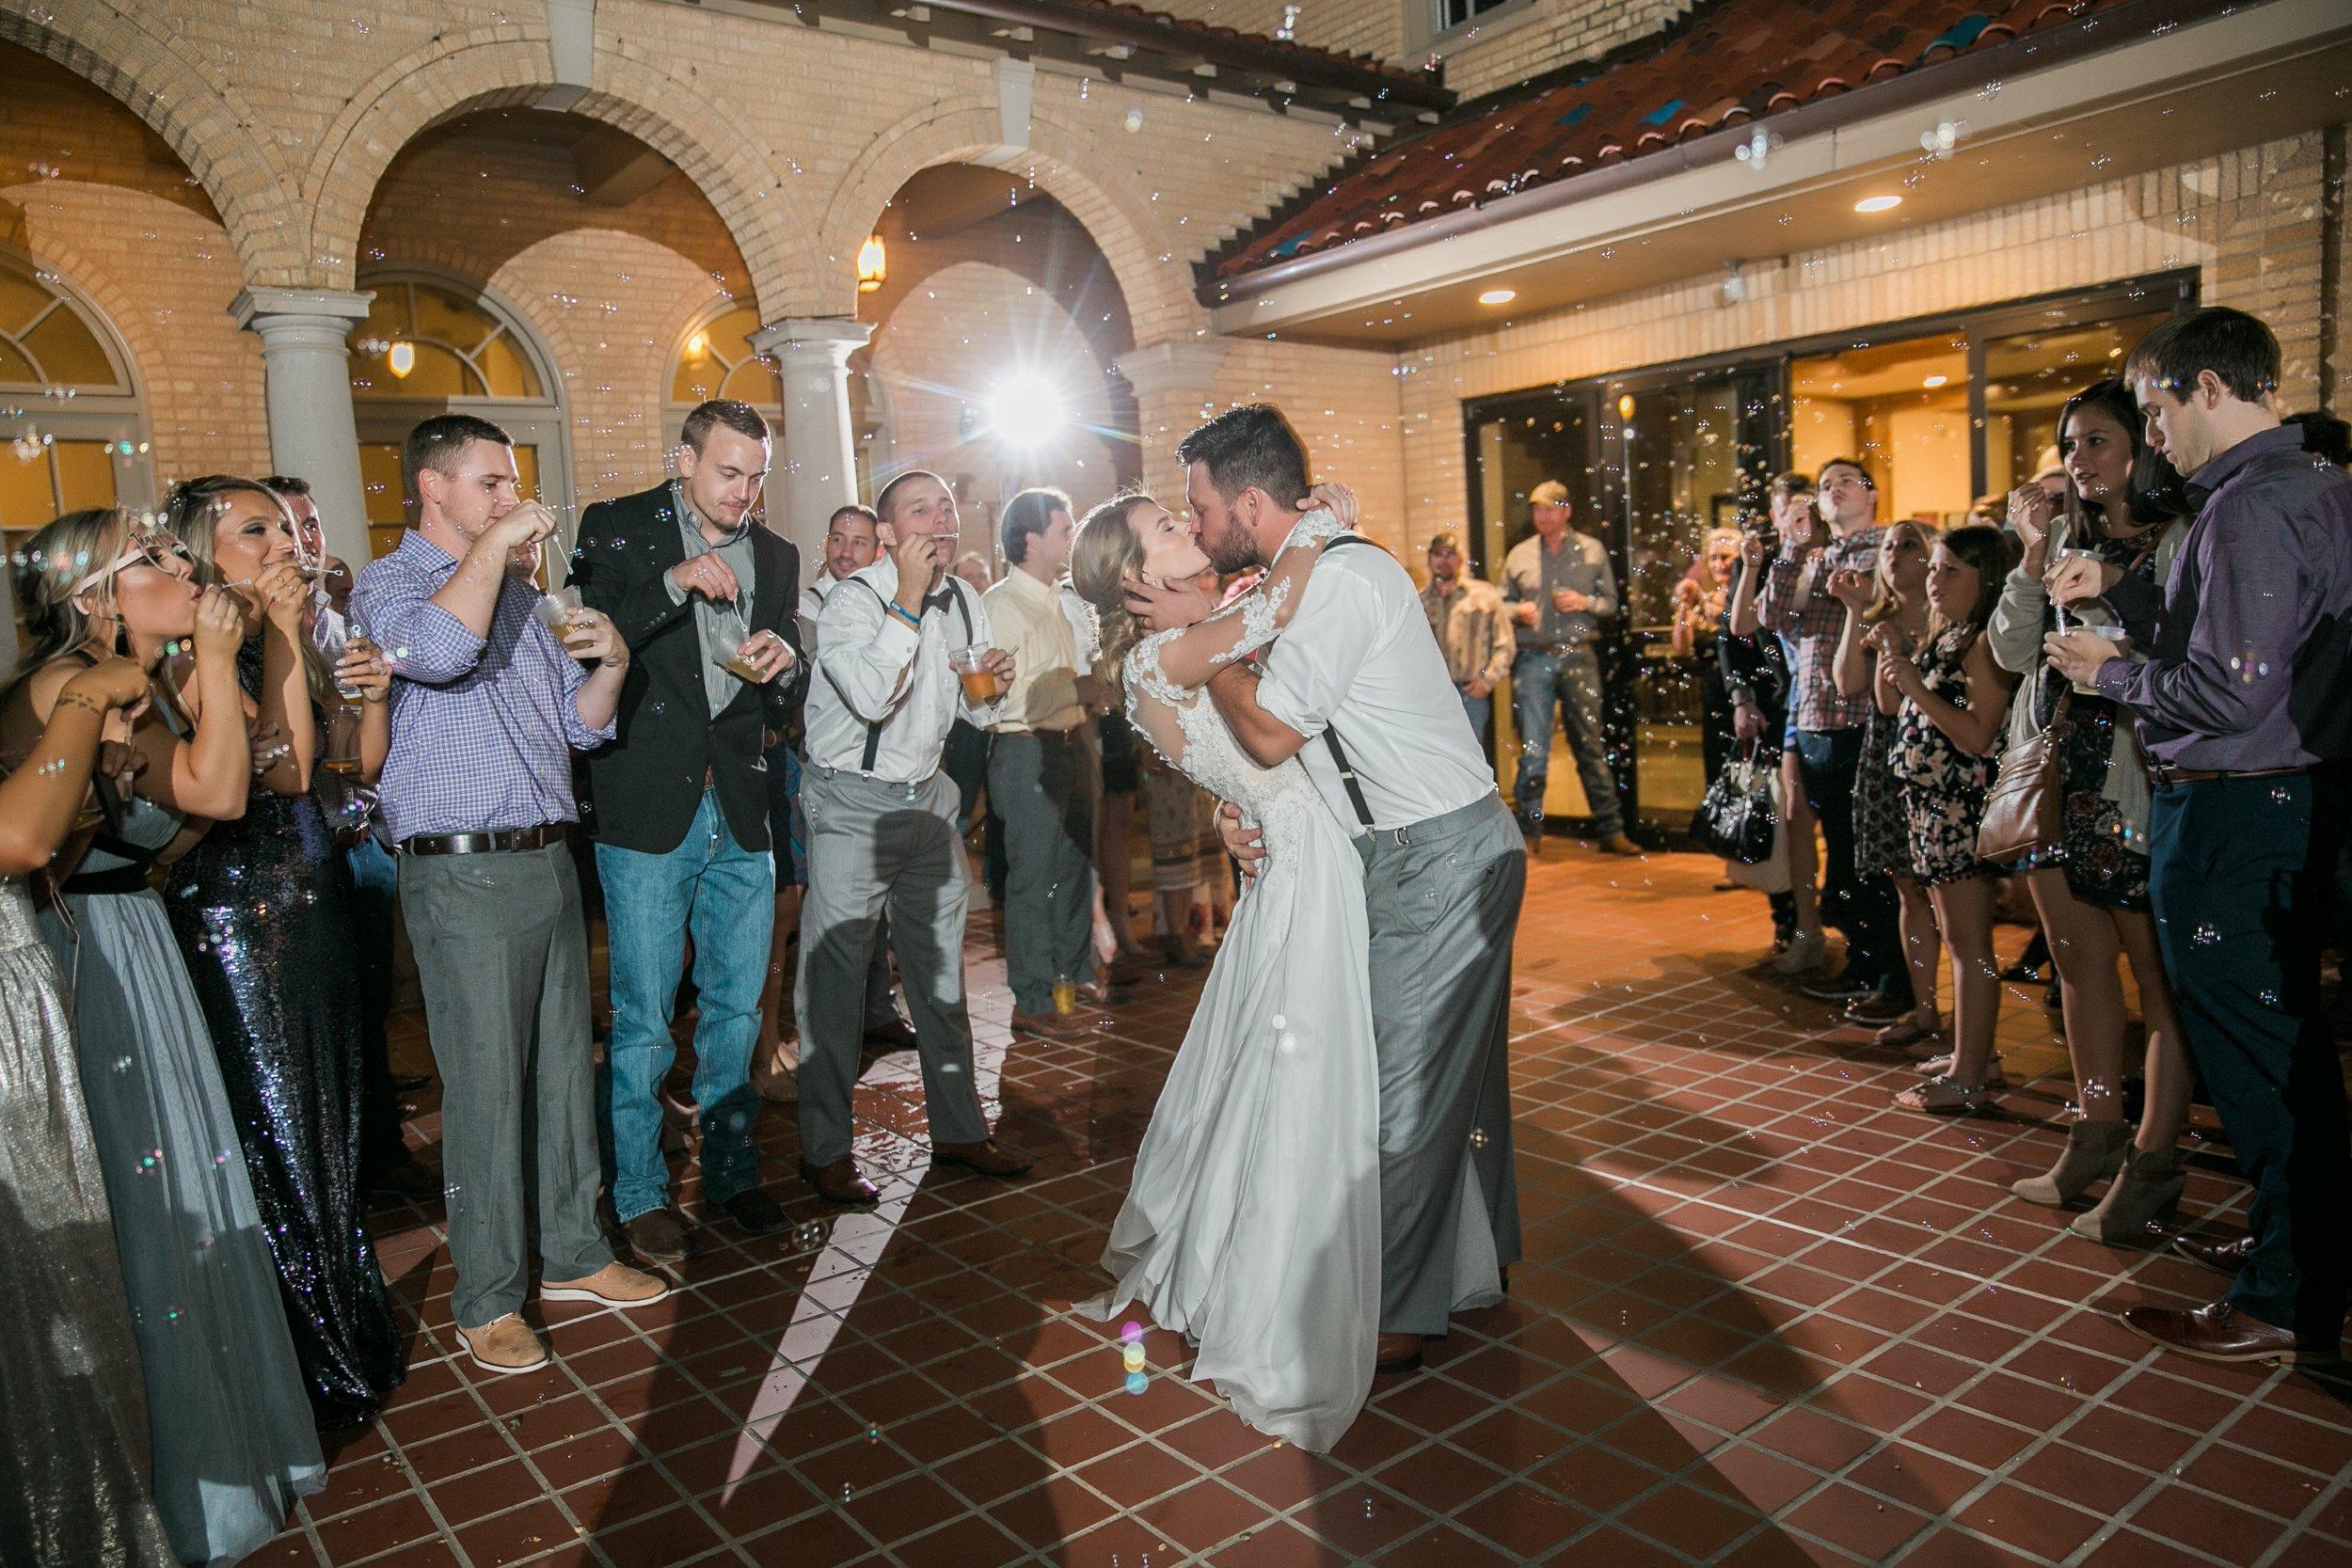 Roberson-Wedding-The-Forum-Lauren-Pinson-Wedding-Photography-Wichita-Falls-Texas-089.jpg